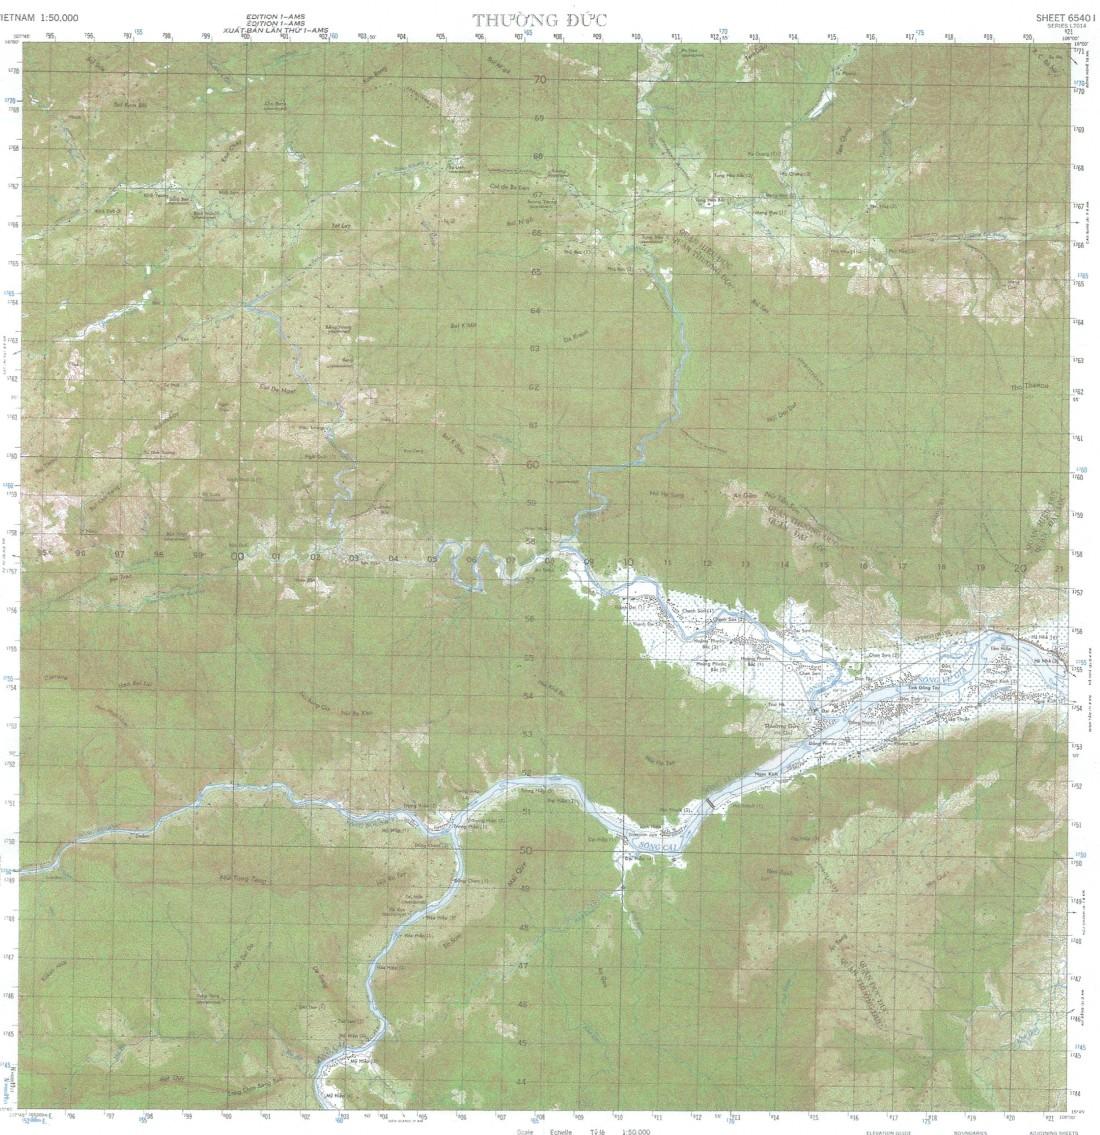 Thuong Duc Map